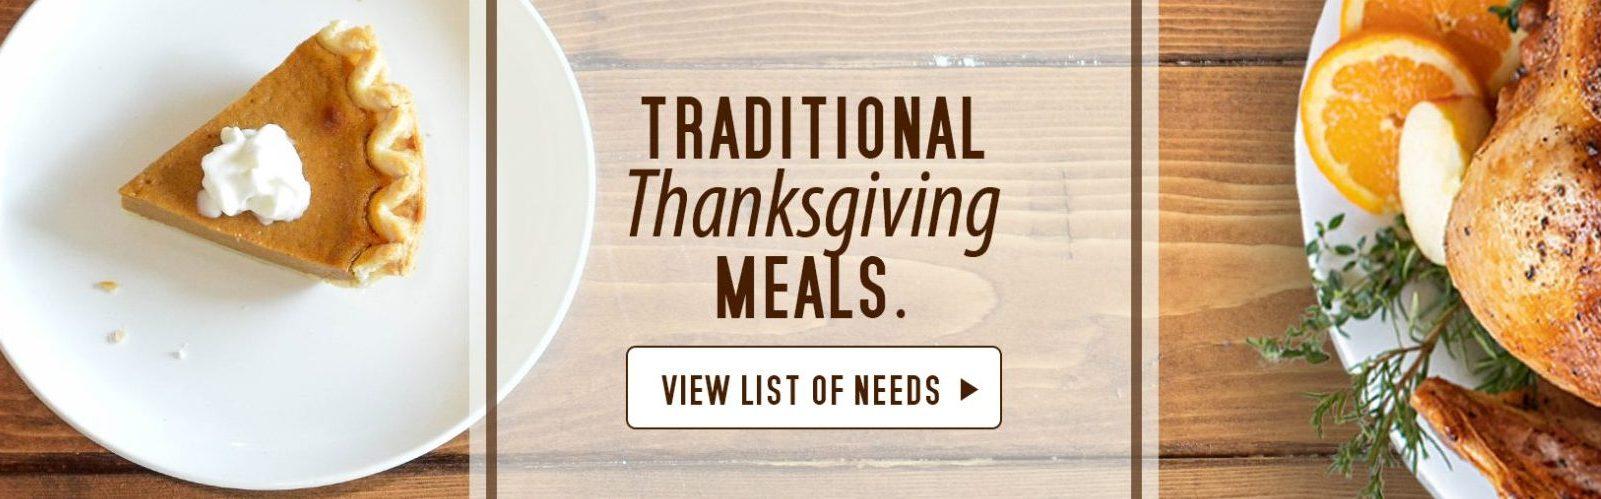 RRM_Thanksgiving_2600x650